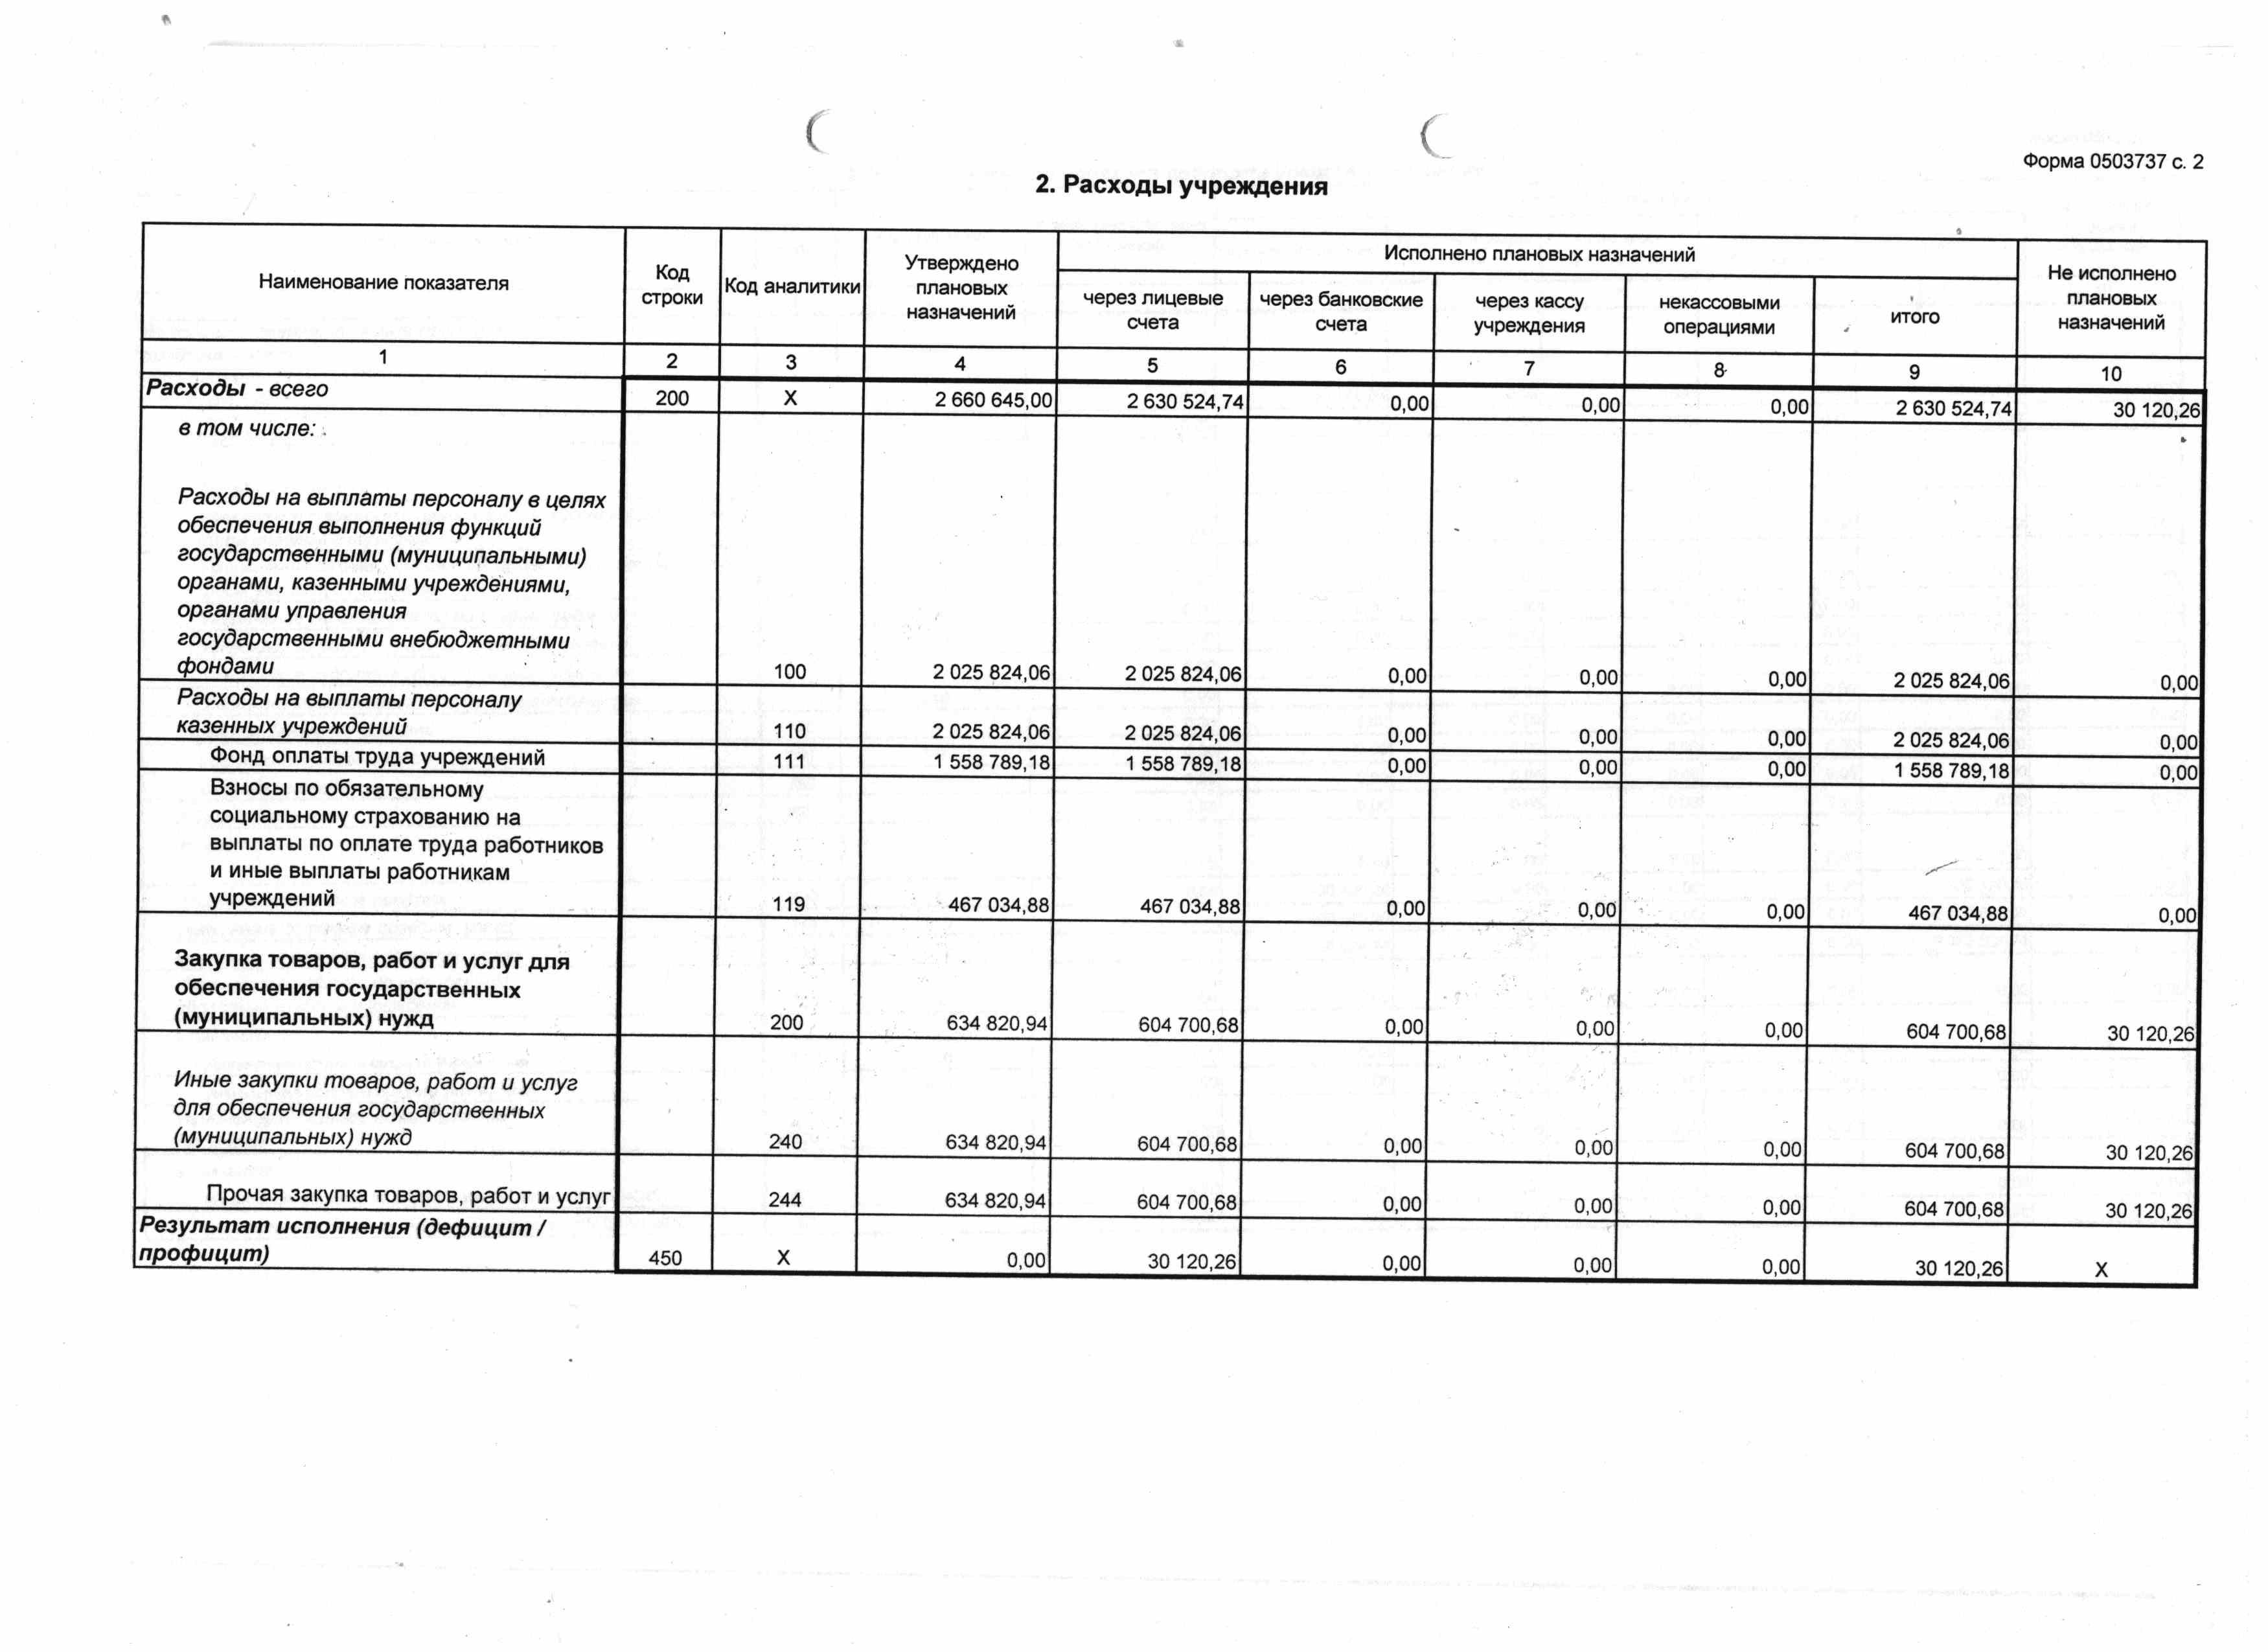 форма 737 Отчет плана ФХД доходы ЦППРиК 2018 2